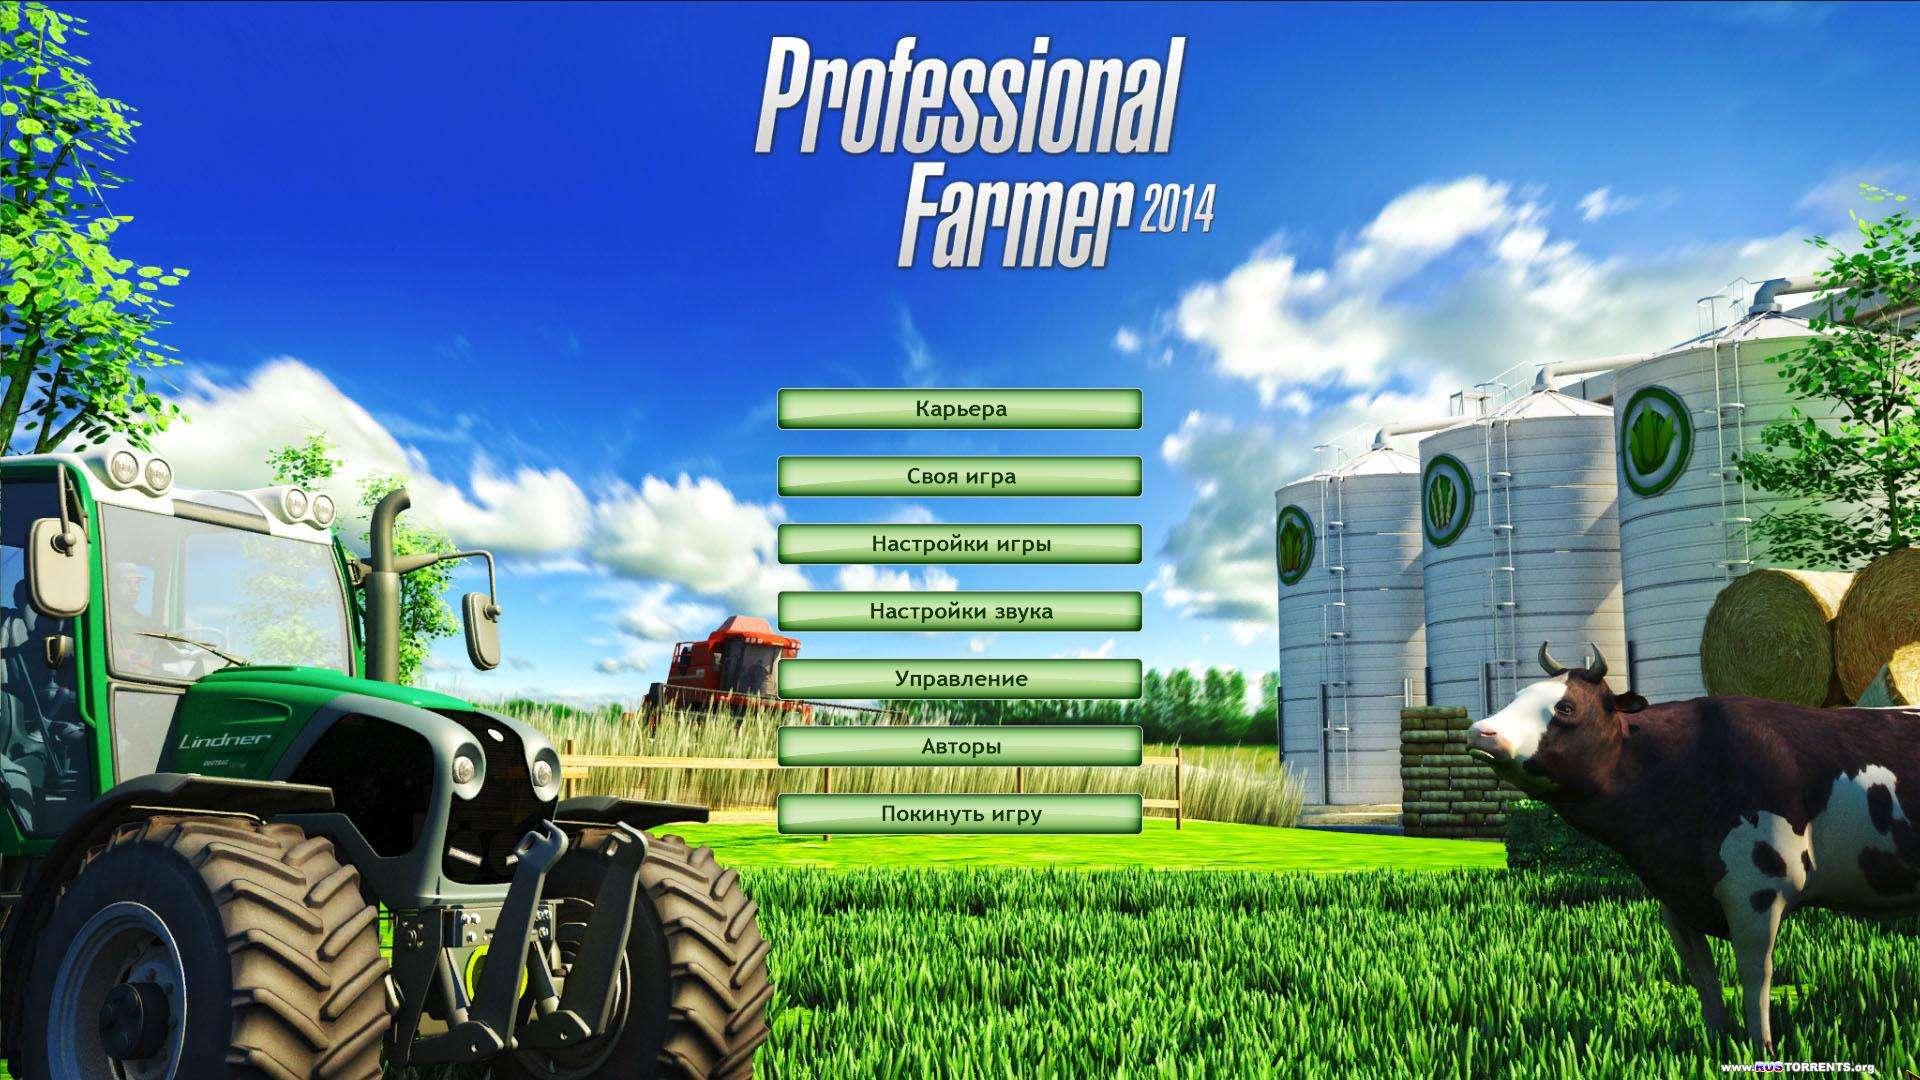 Professional Farmer 2014. Collector's Edition [v 1.0.14 + 1 DLC] (2013) PC | Repack от Fenixx